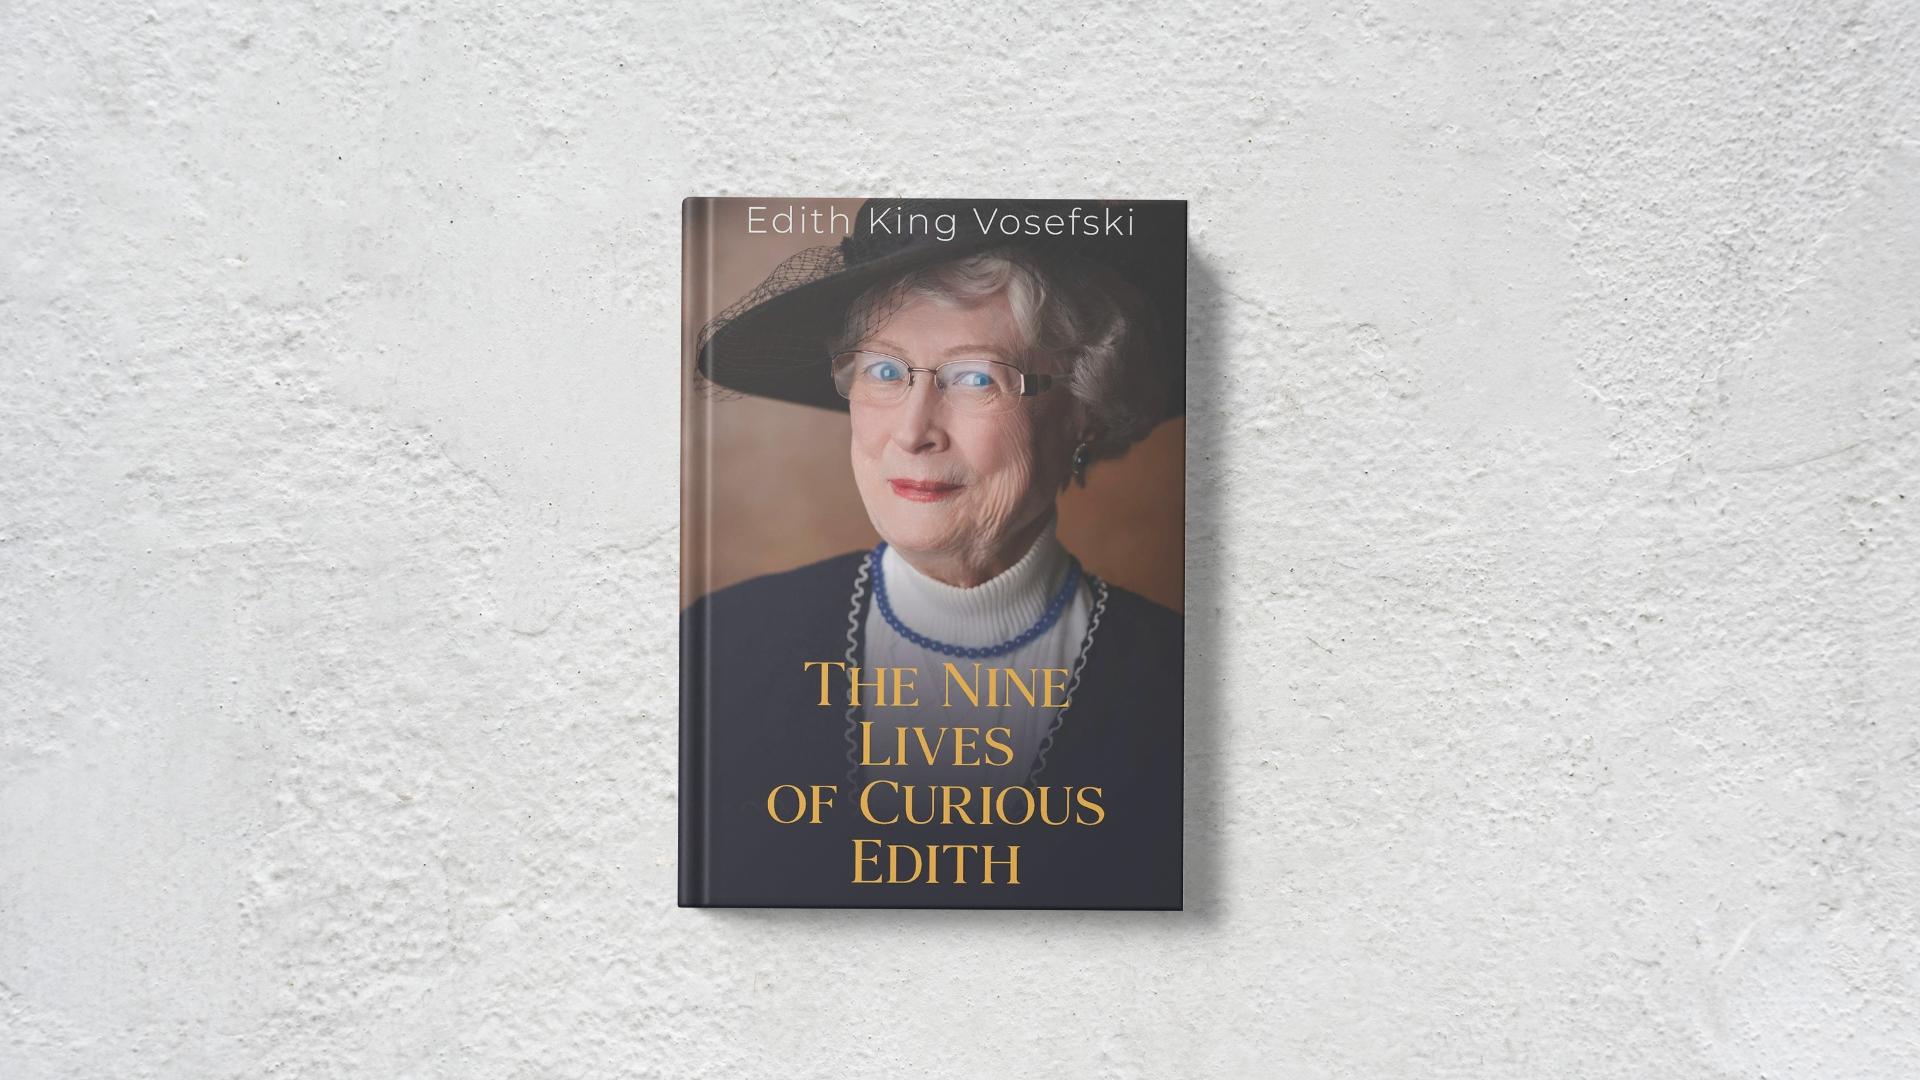 The Nine Lives of Curious Edith Vosefski banne bannerr